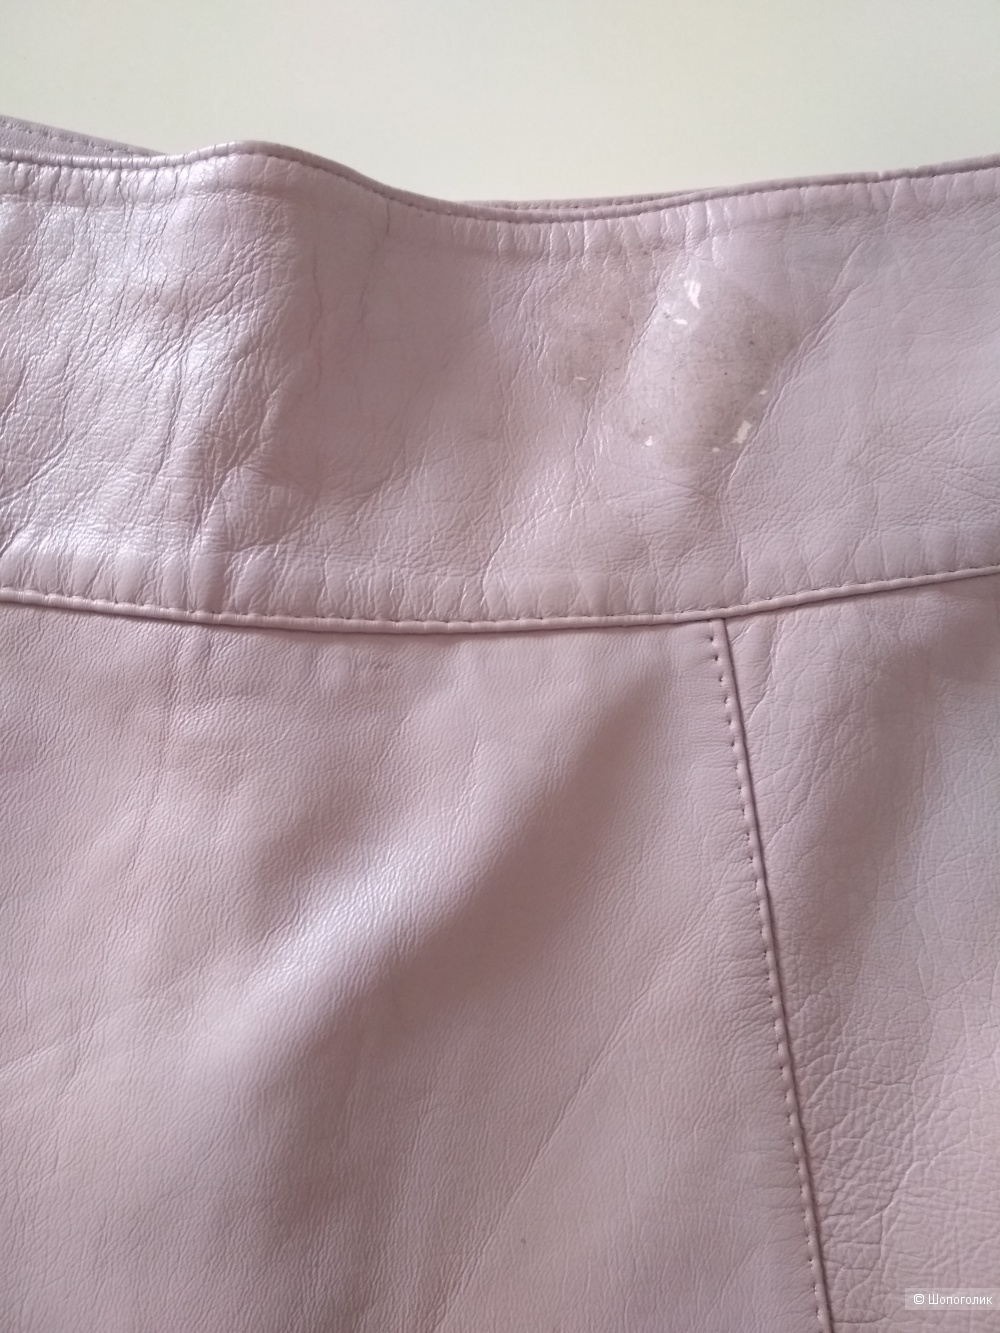 Кожаная юбка Estelle, р. 44-46